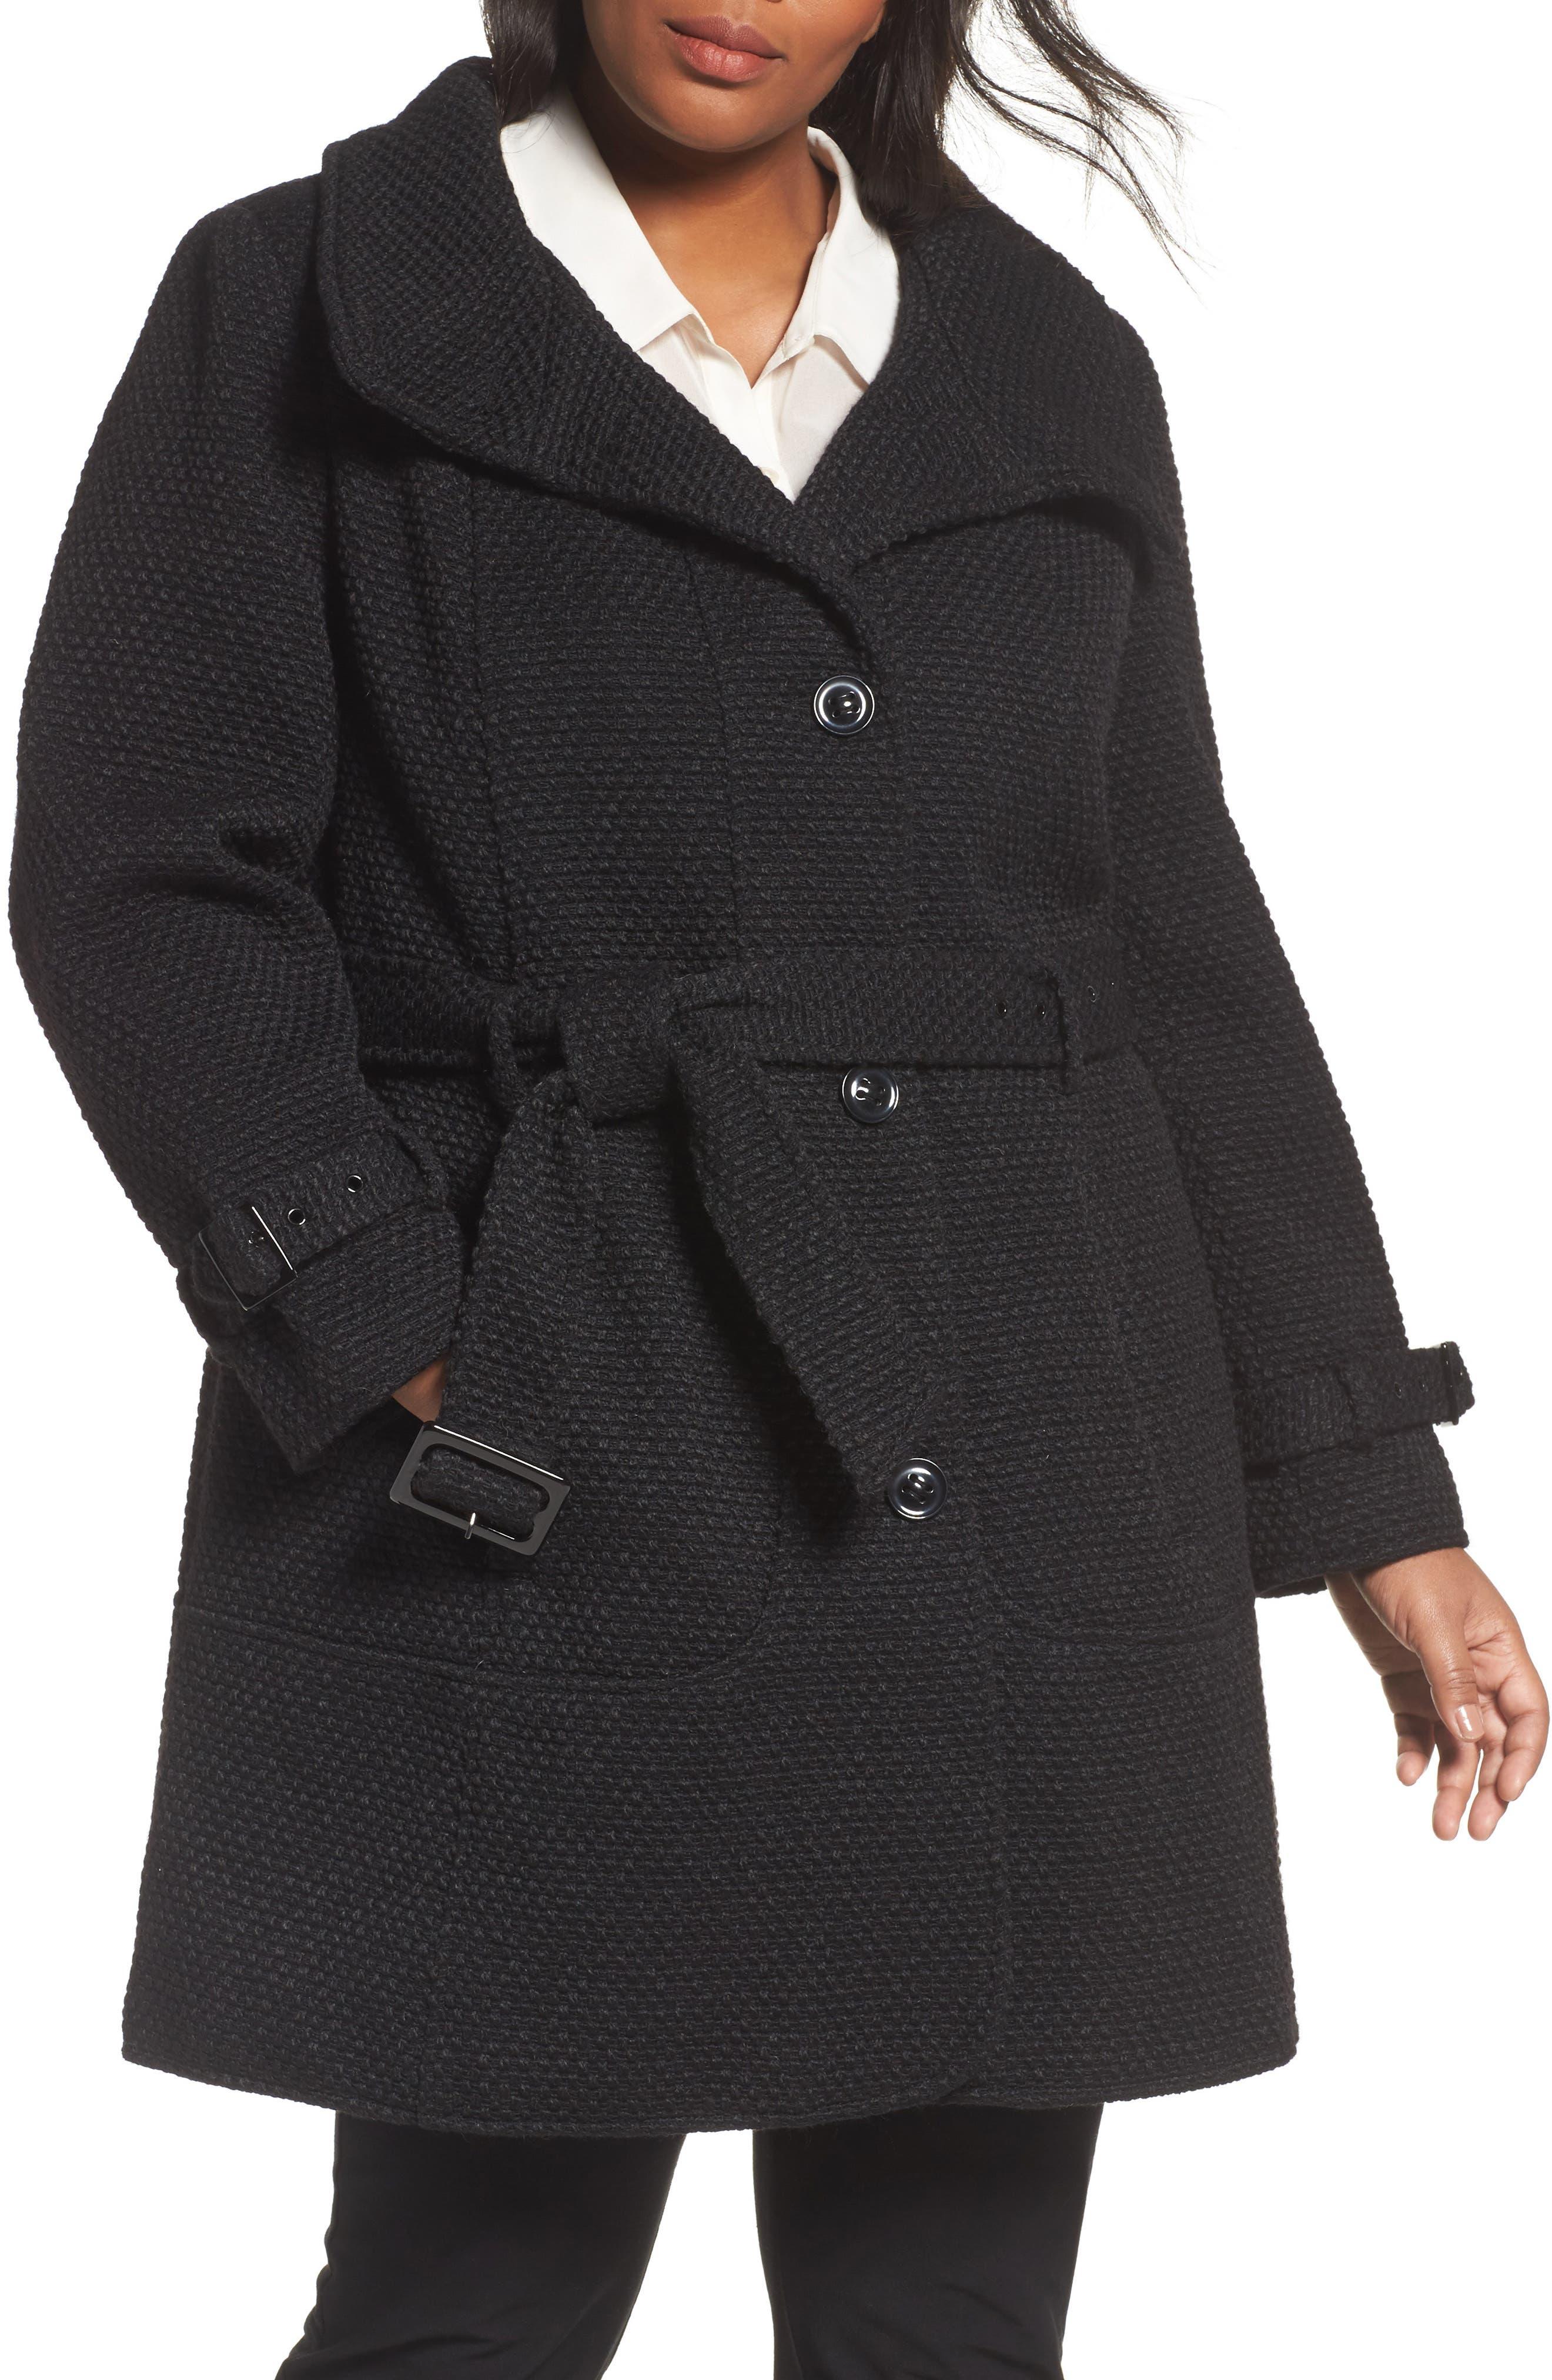 Waffle Woven Coat,                         Main,                         color, 001